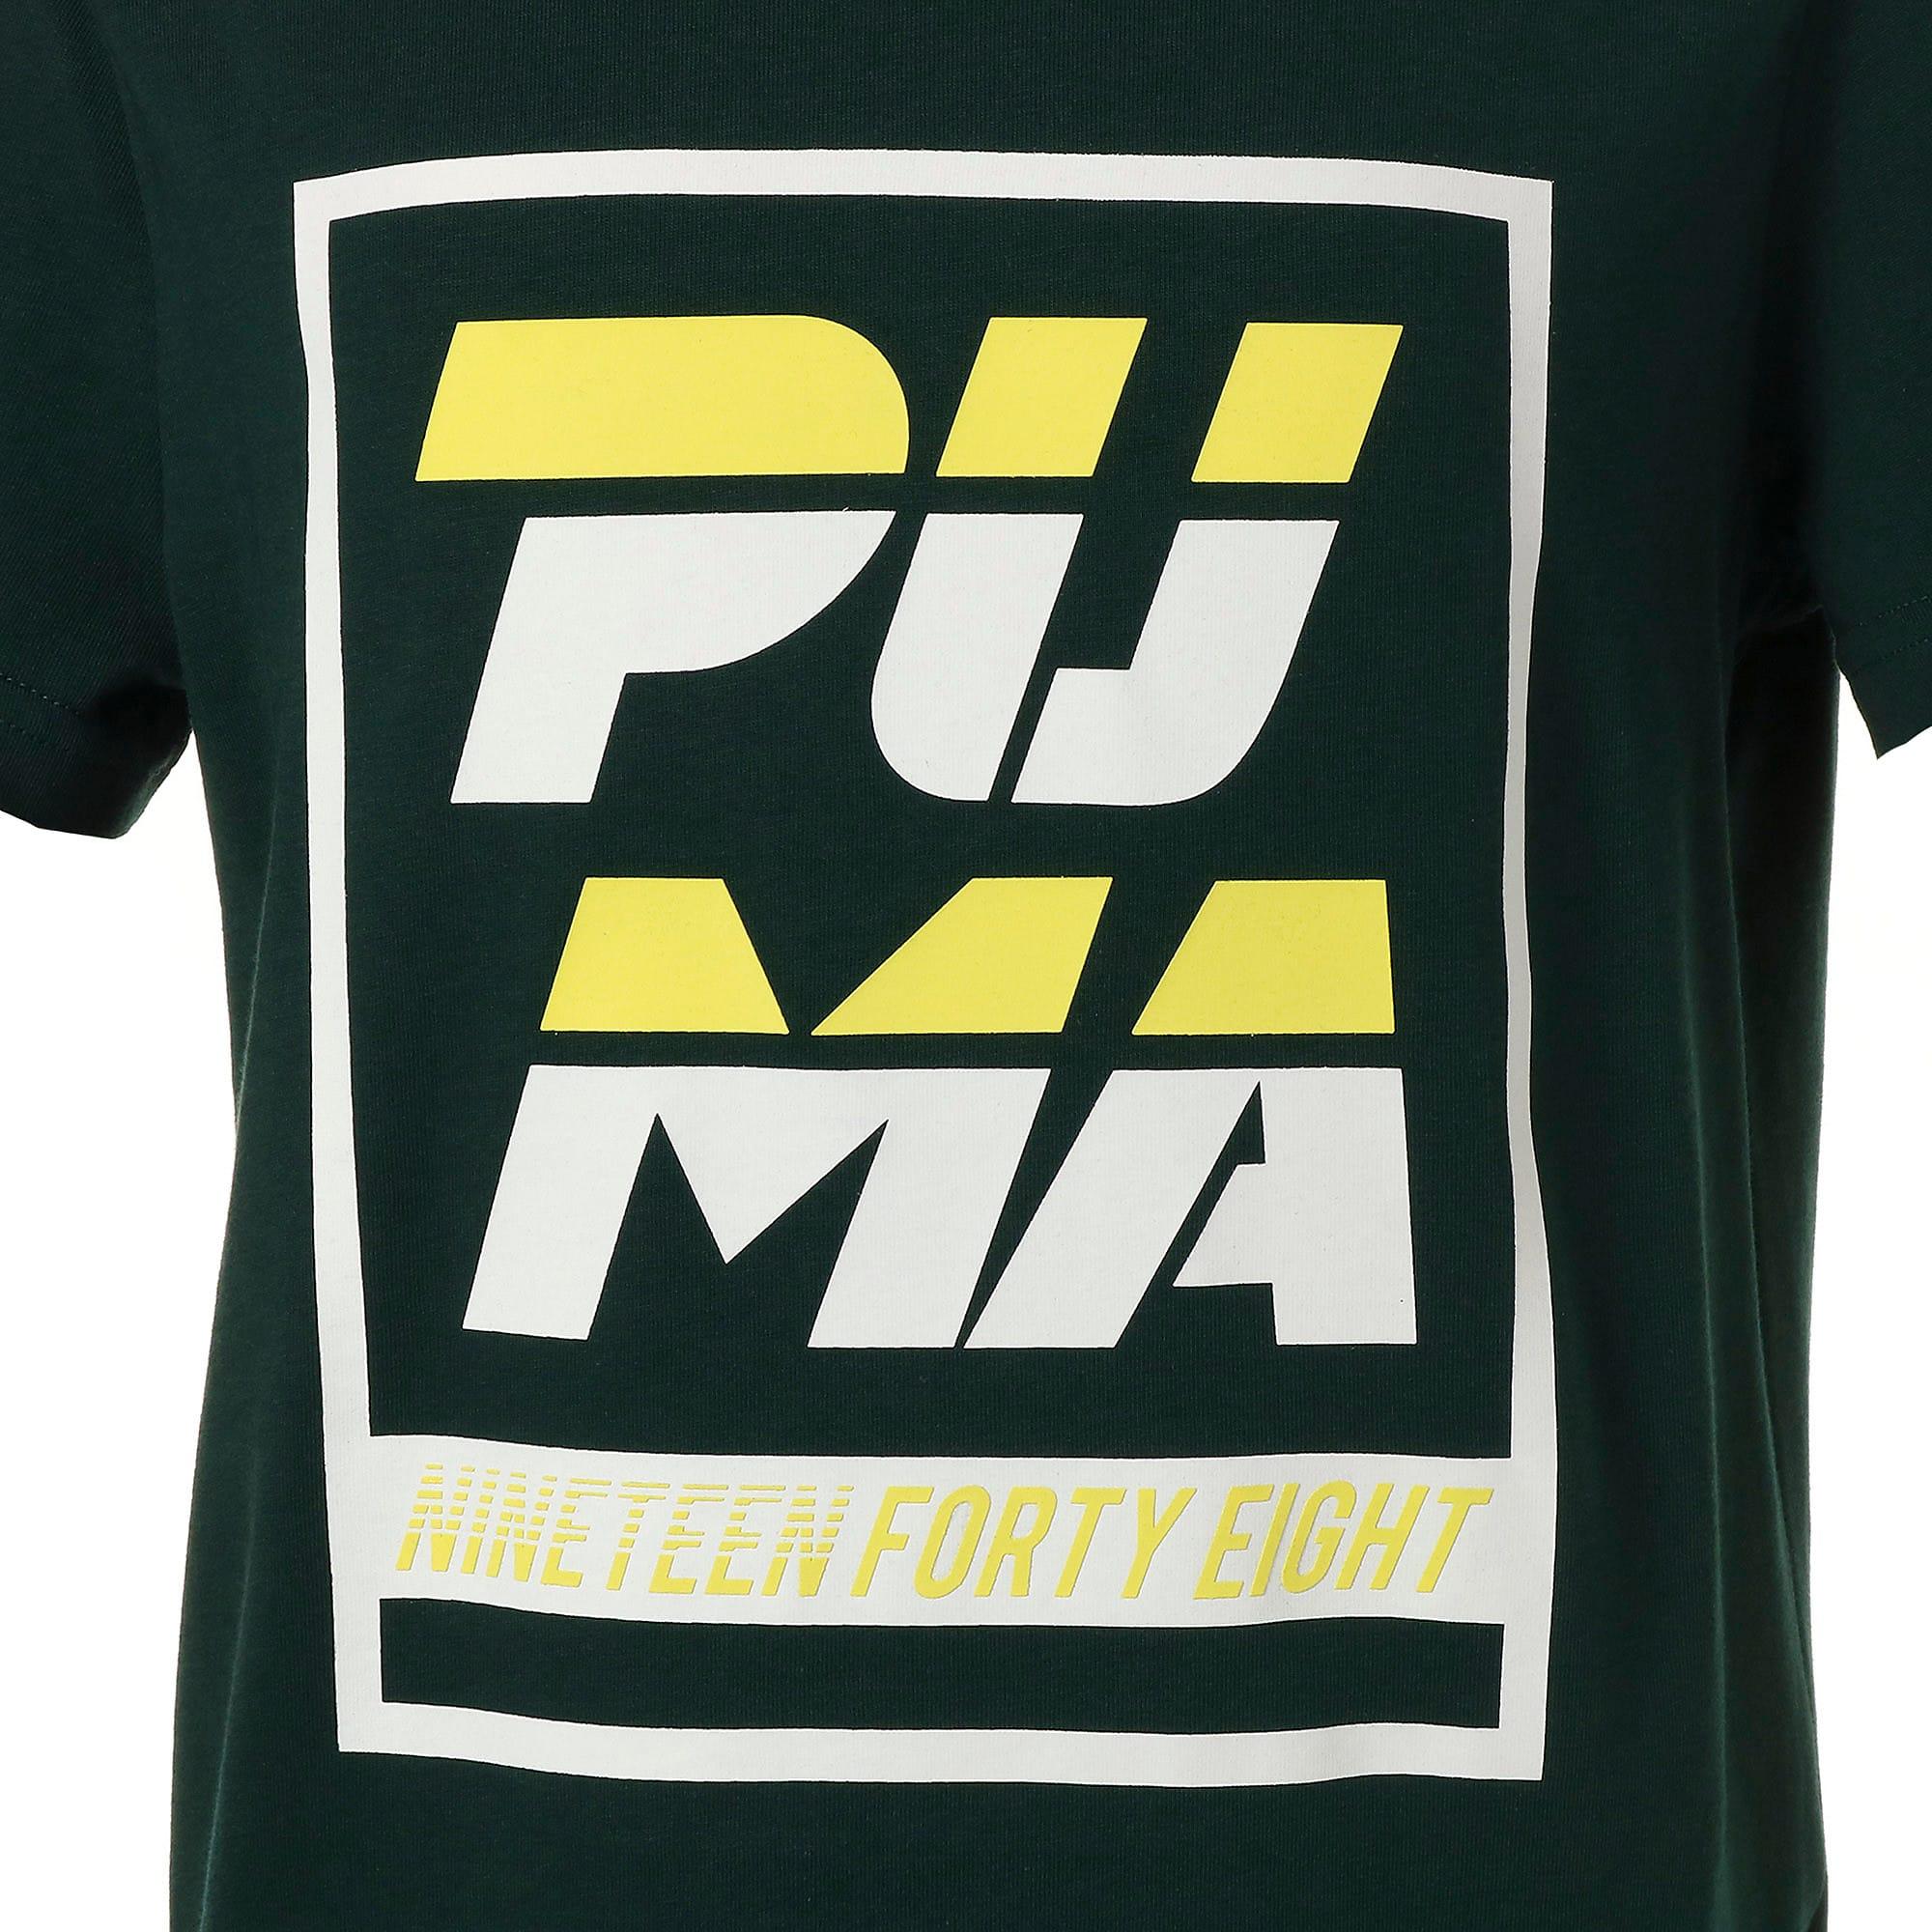 Thumbnail 7 of キッズ ALPHA SS グラフィック Tシャツ 半袖, Ponderosa Pine, medium-JPN